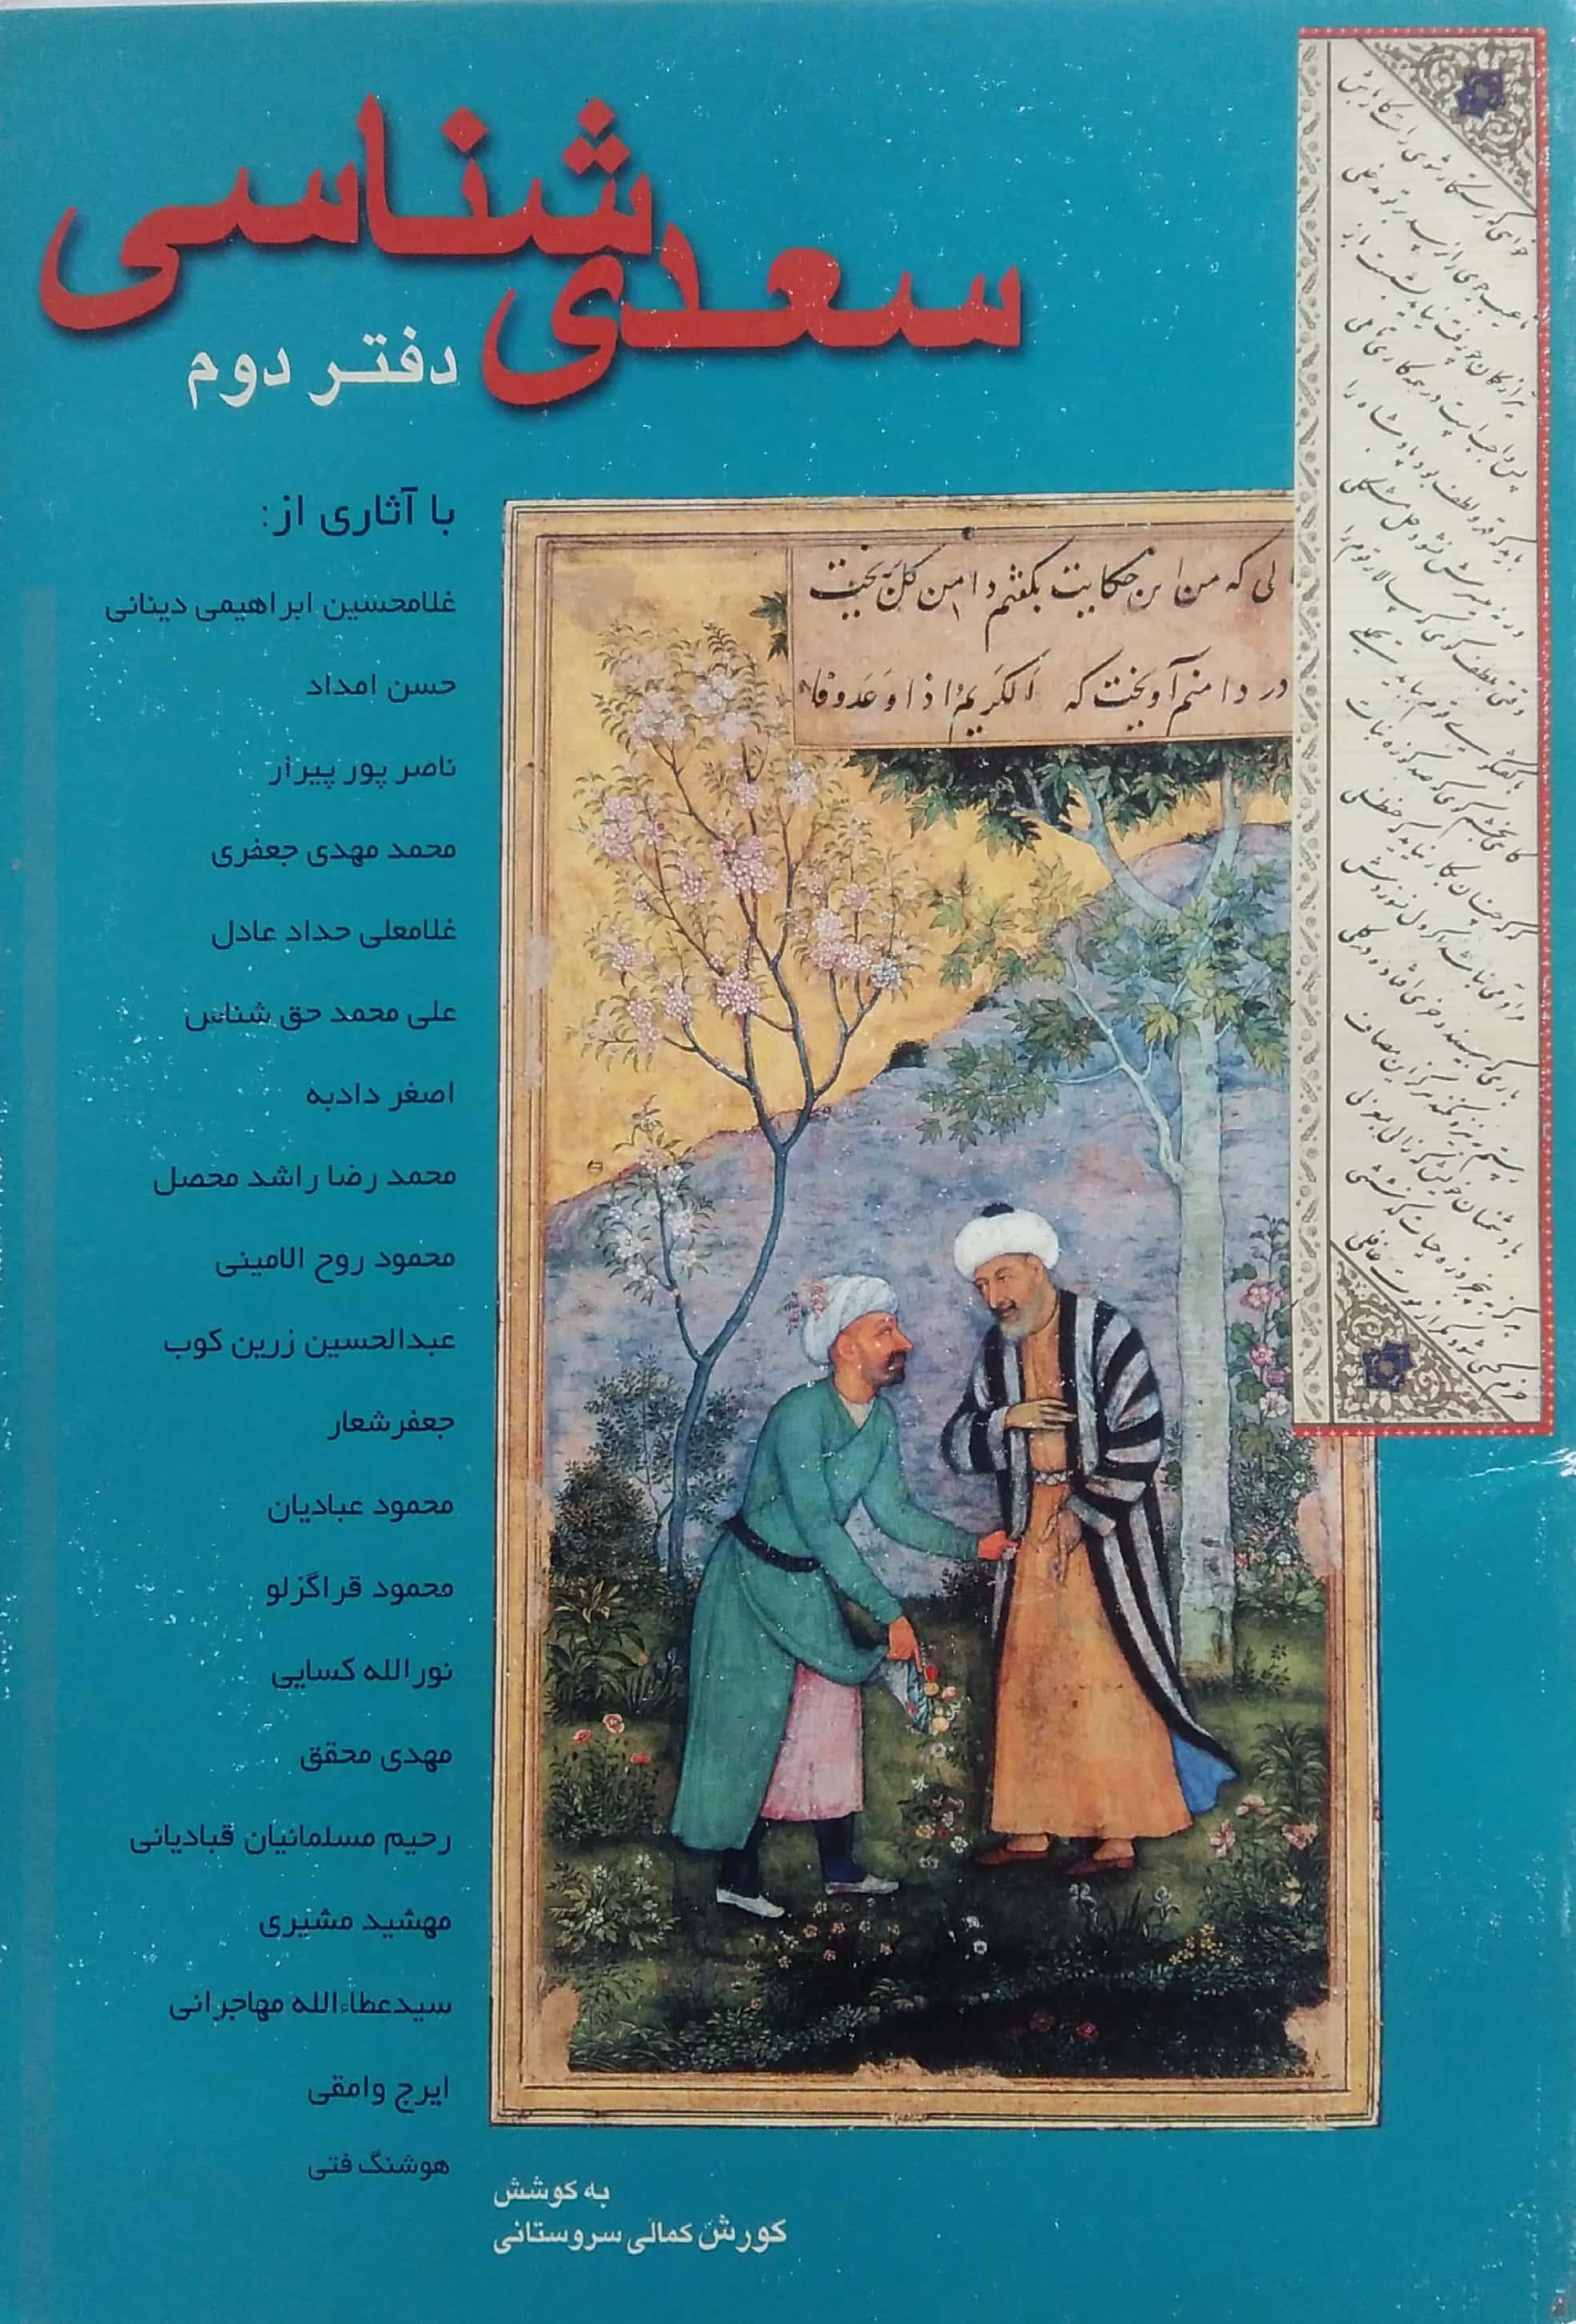 بنياد فارس شناسي سعدی شناسی دفتر دوم (به کوشش کوروش کمالی سروستانی)